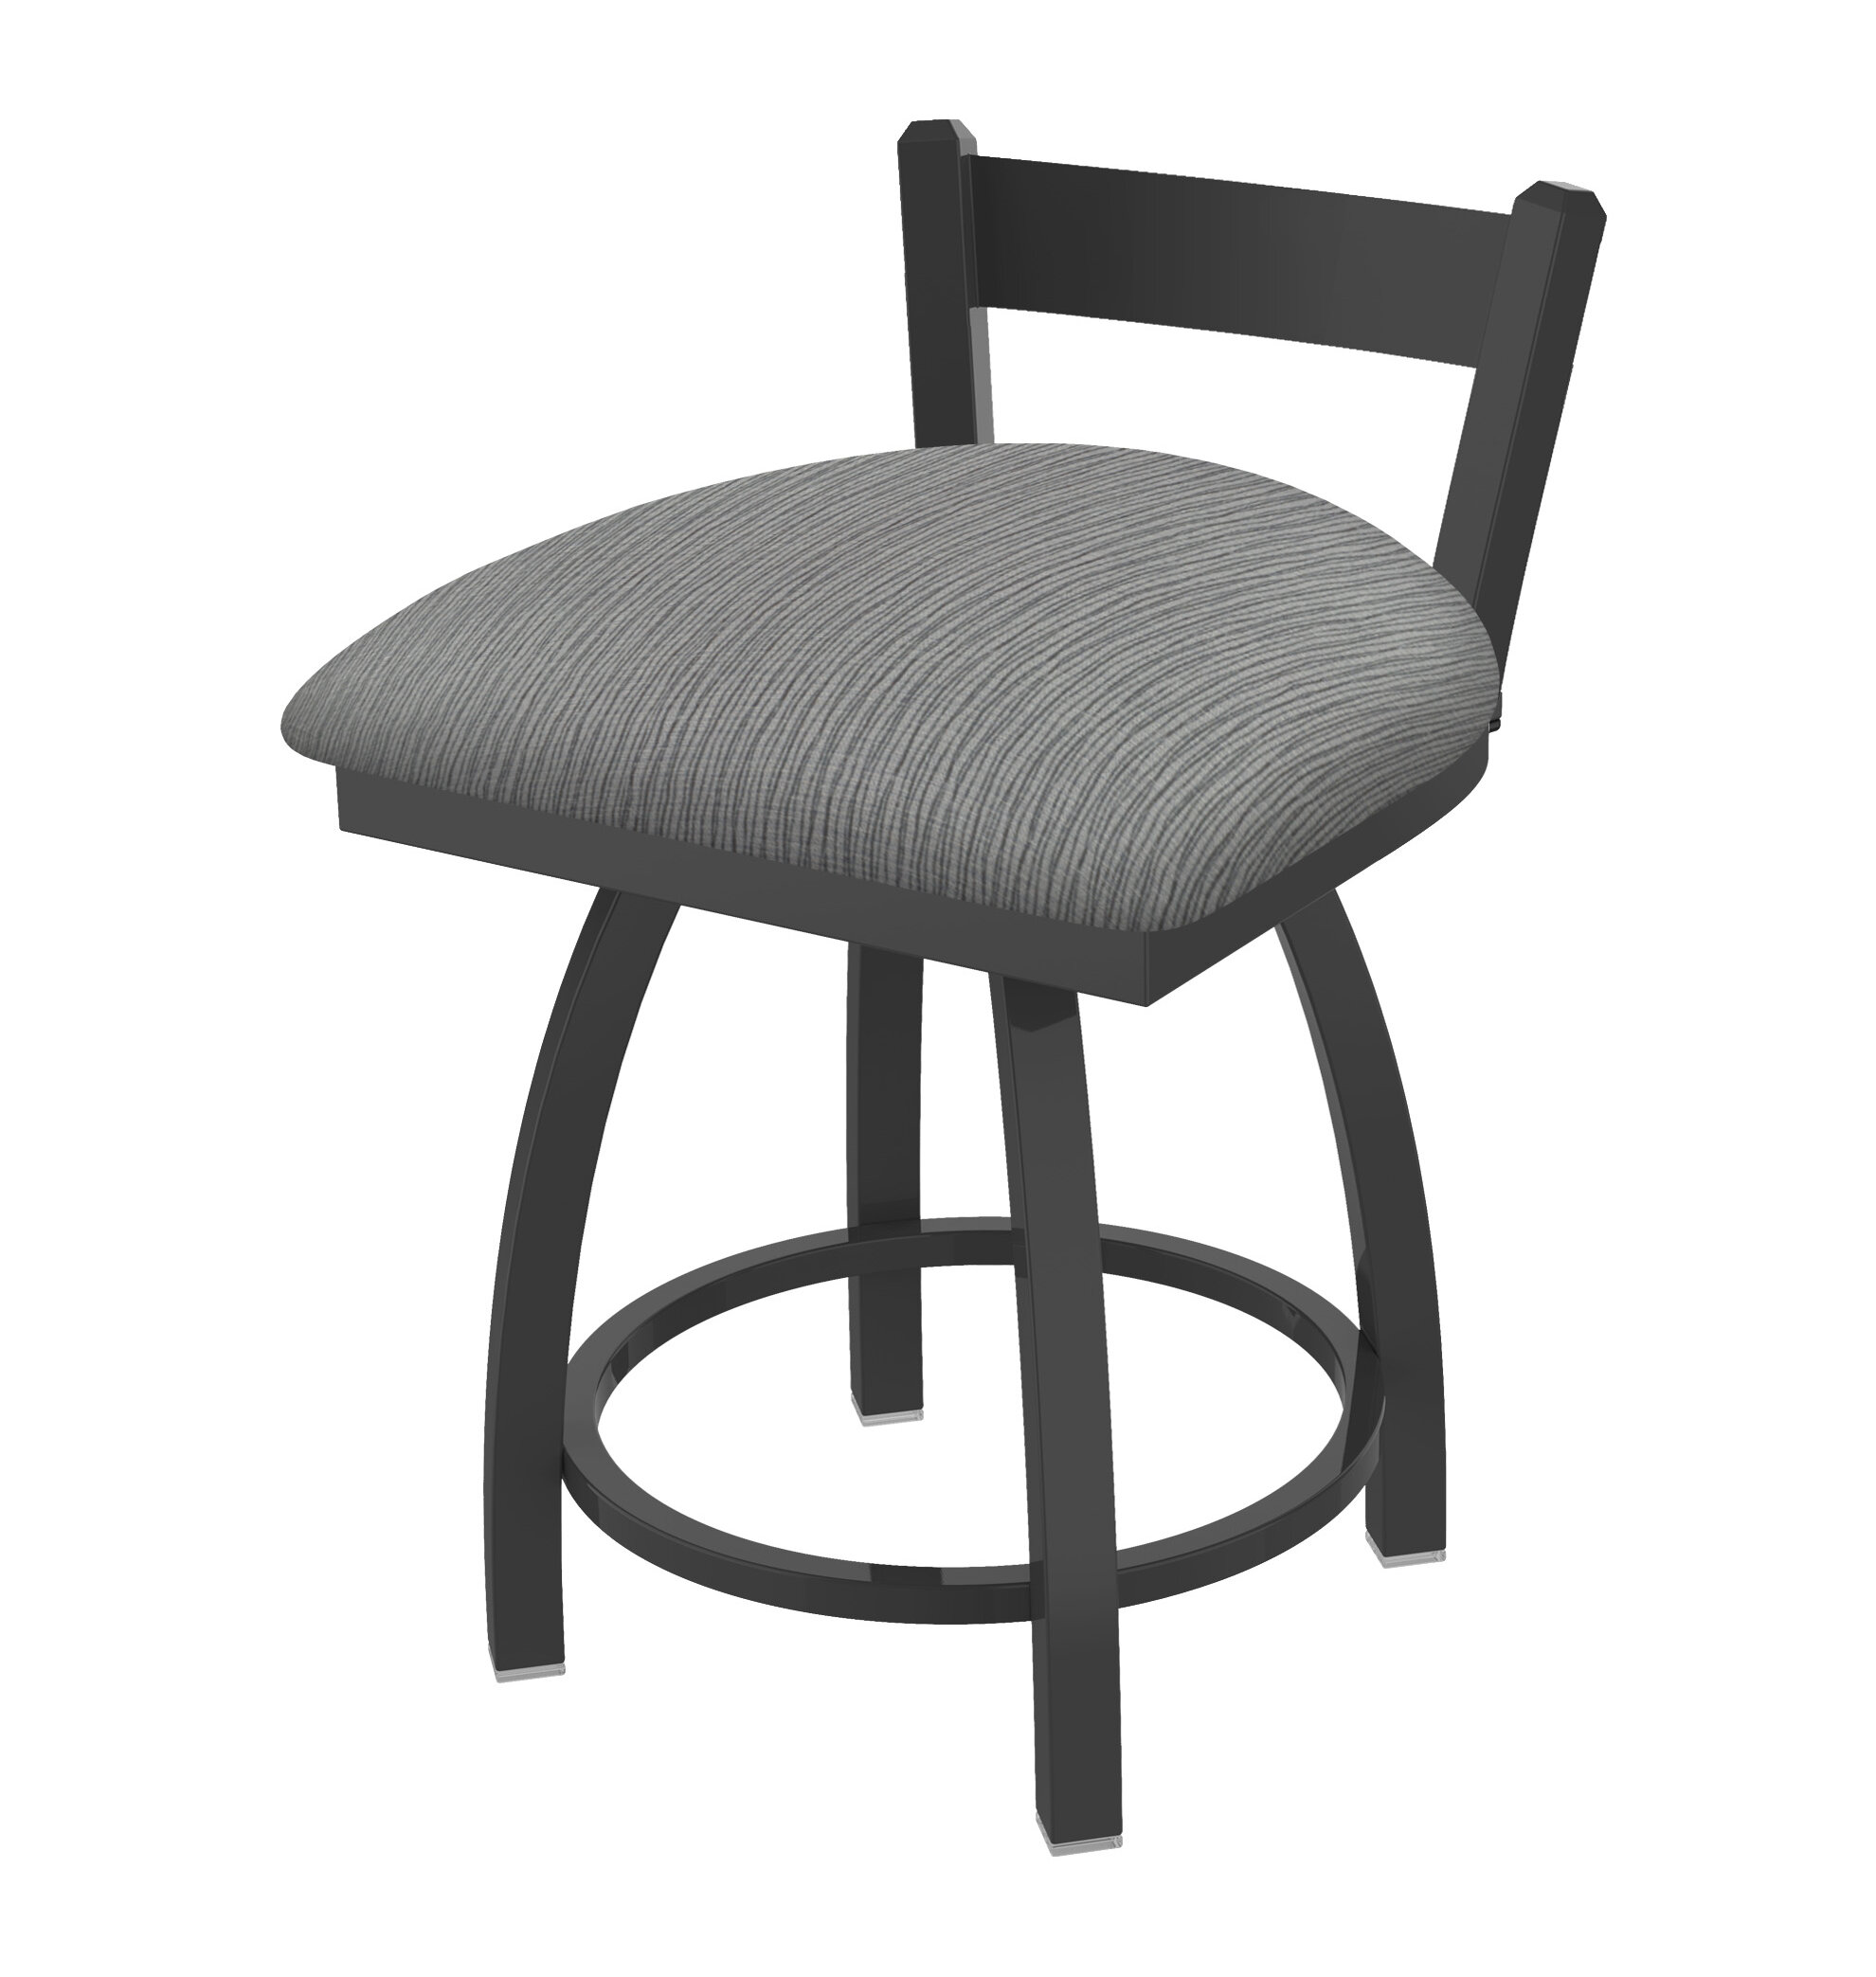 Sea Foam Chair Accent Stools You Ll Love In 2021 Wayfair